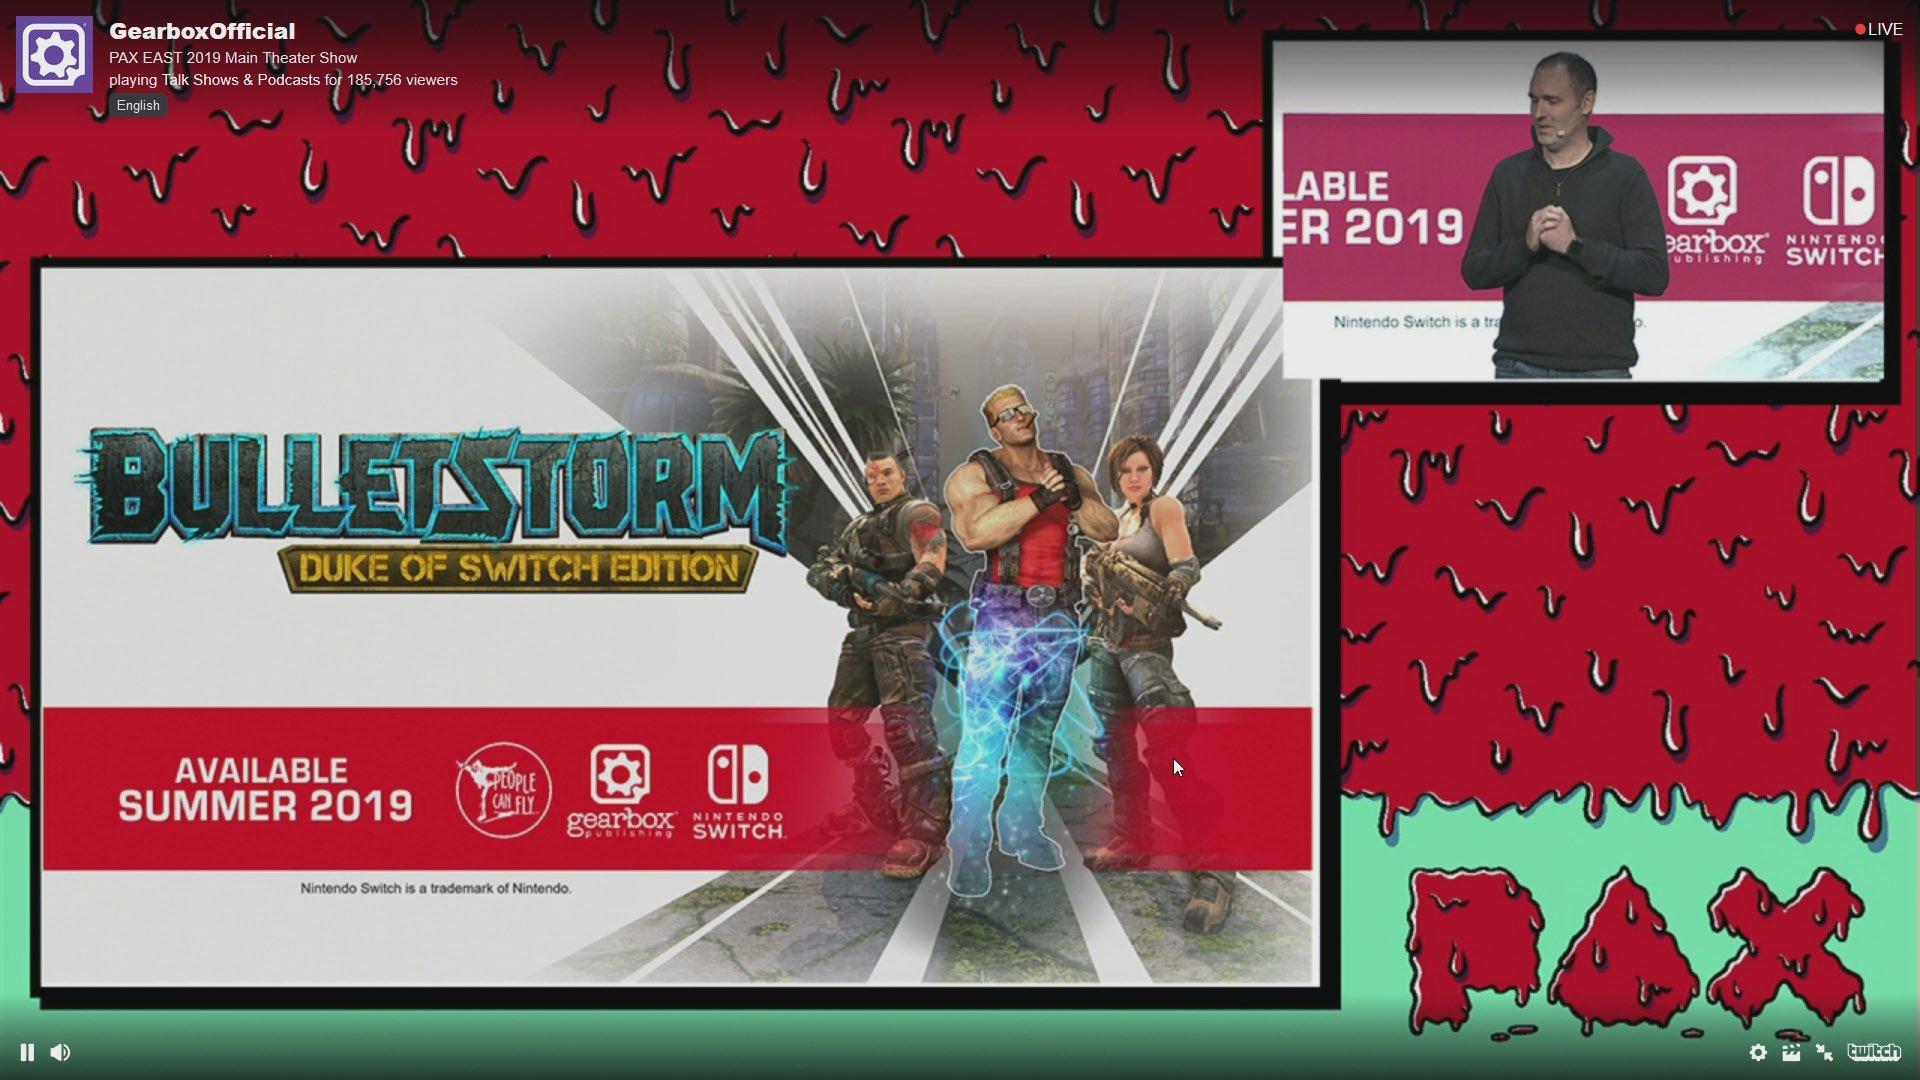 Bulletstorm Duke of Switch Edition revealed